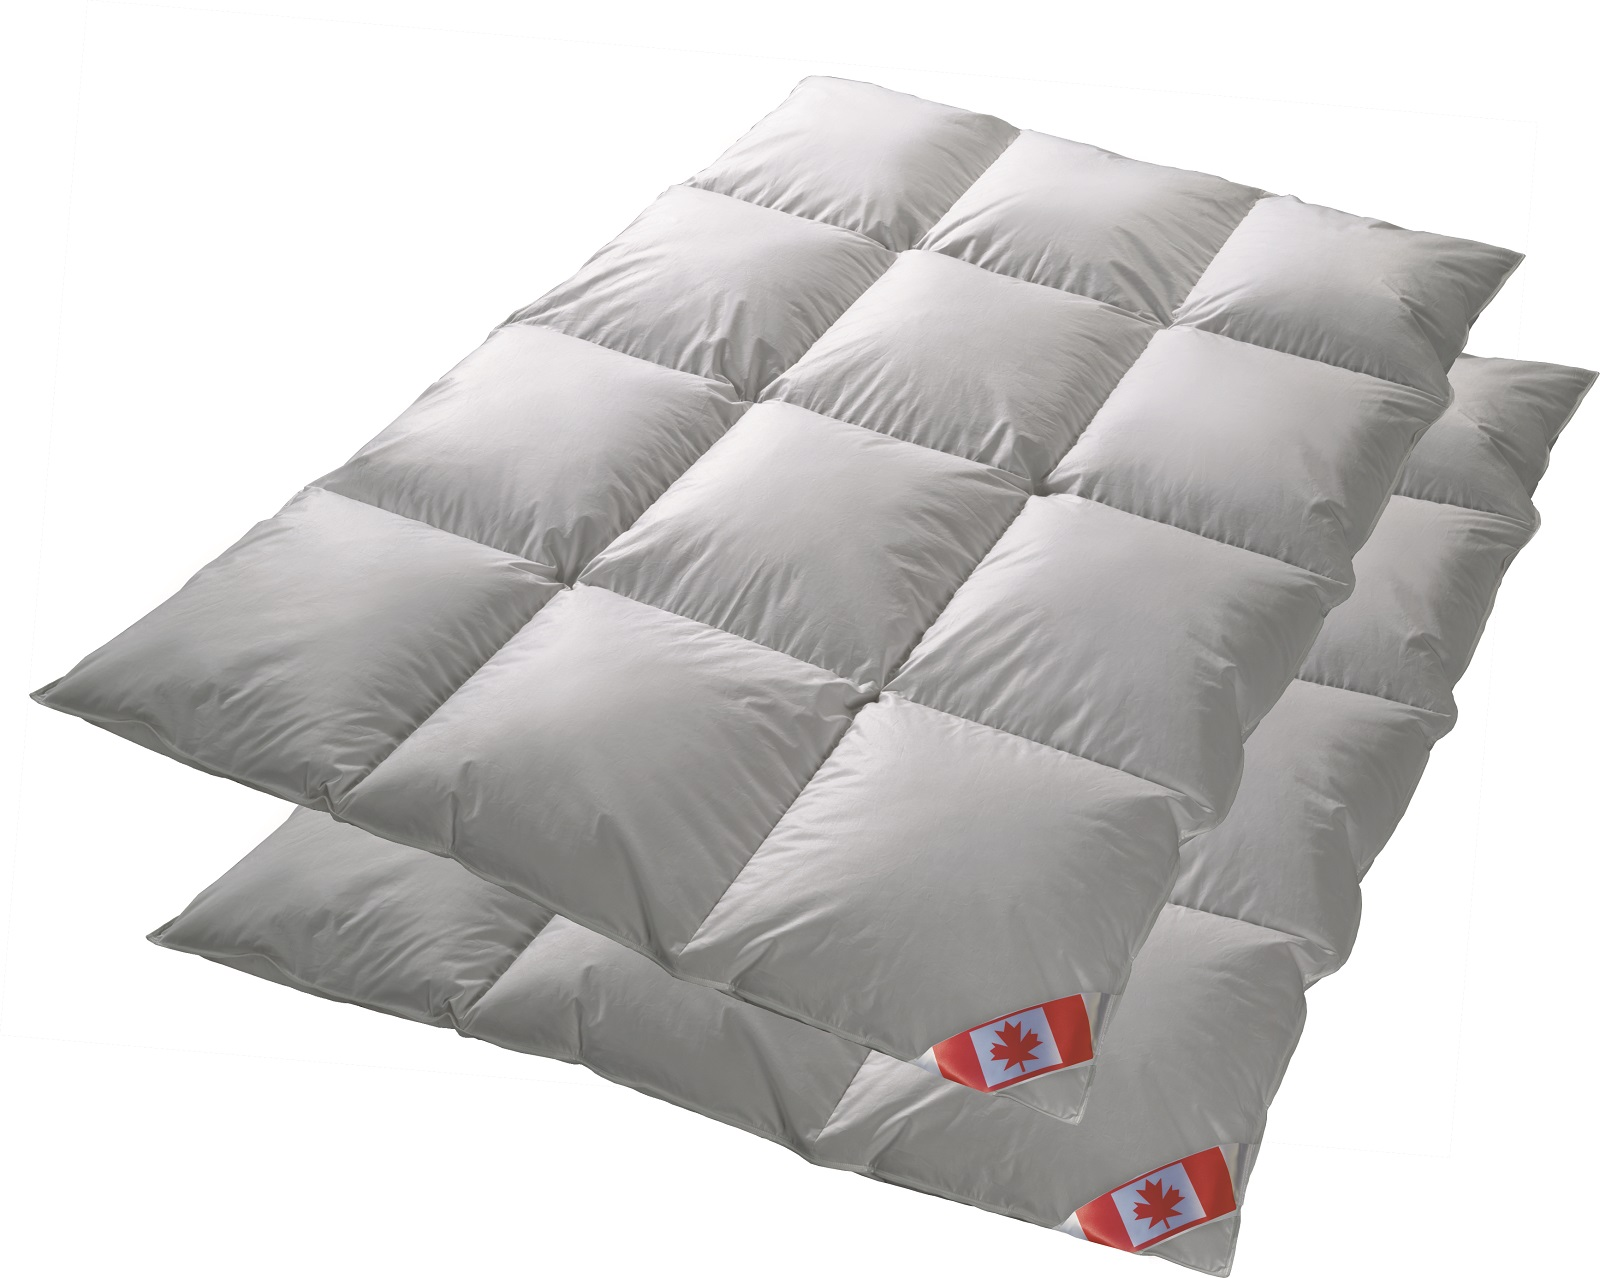 Angebot 2 Canada Kassetten Daunendecken 100%Daune extra warm Winter 135x200 R5